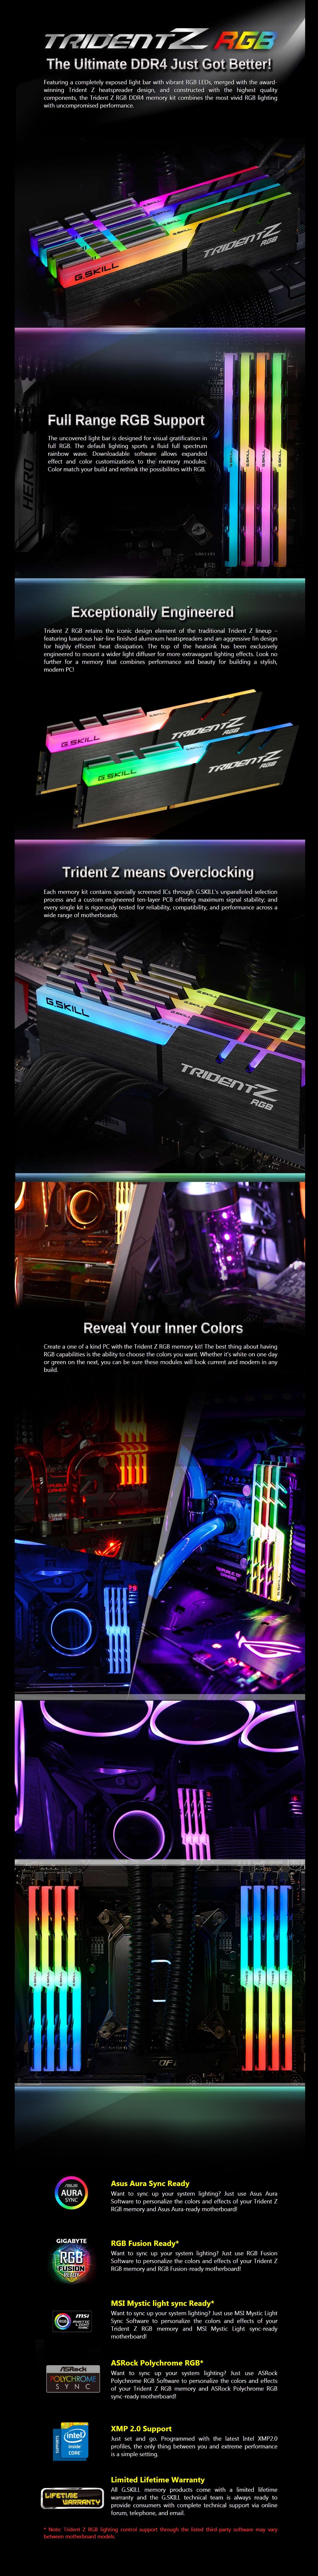 G Skill Trident Z RGB (2x8GB) 3600MHz DDR4 Desktop Memory Kit